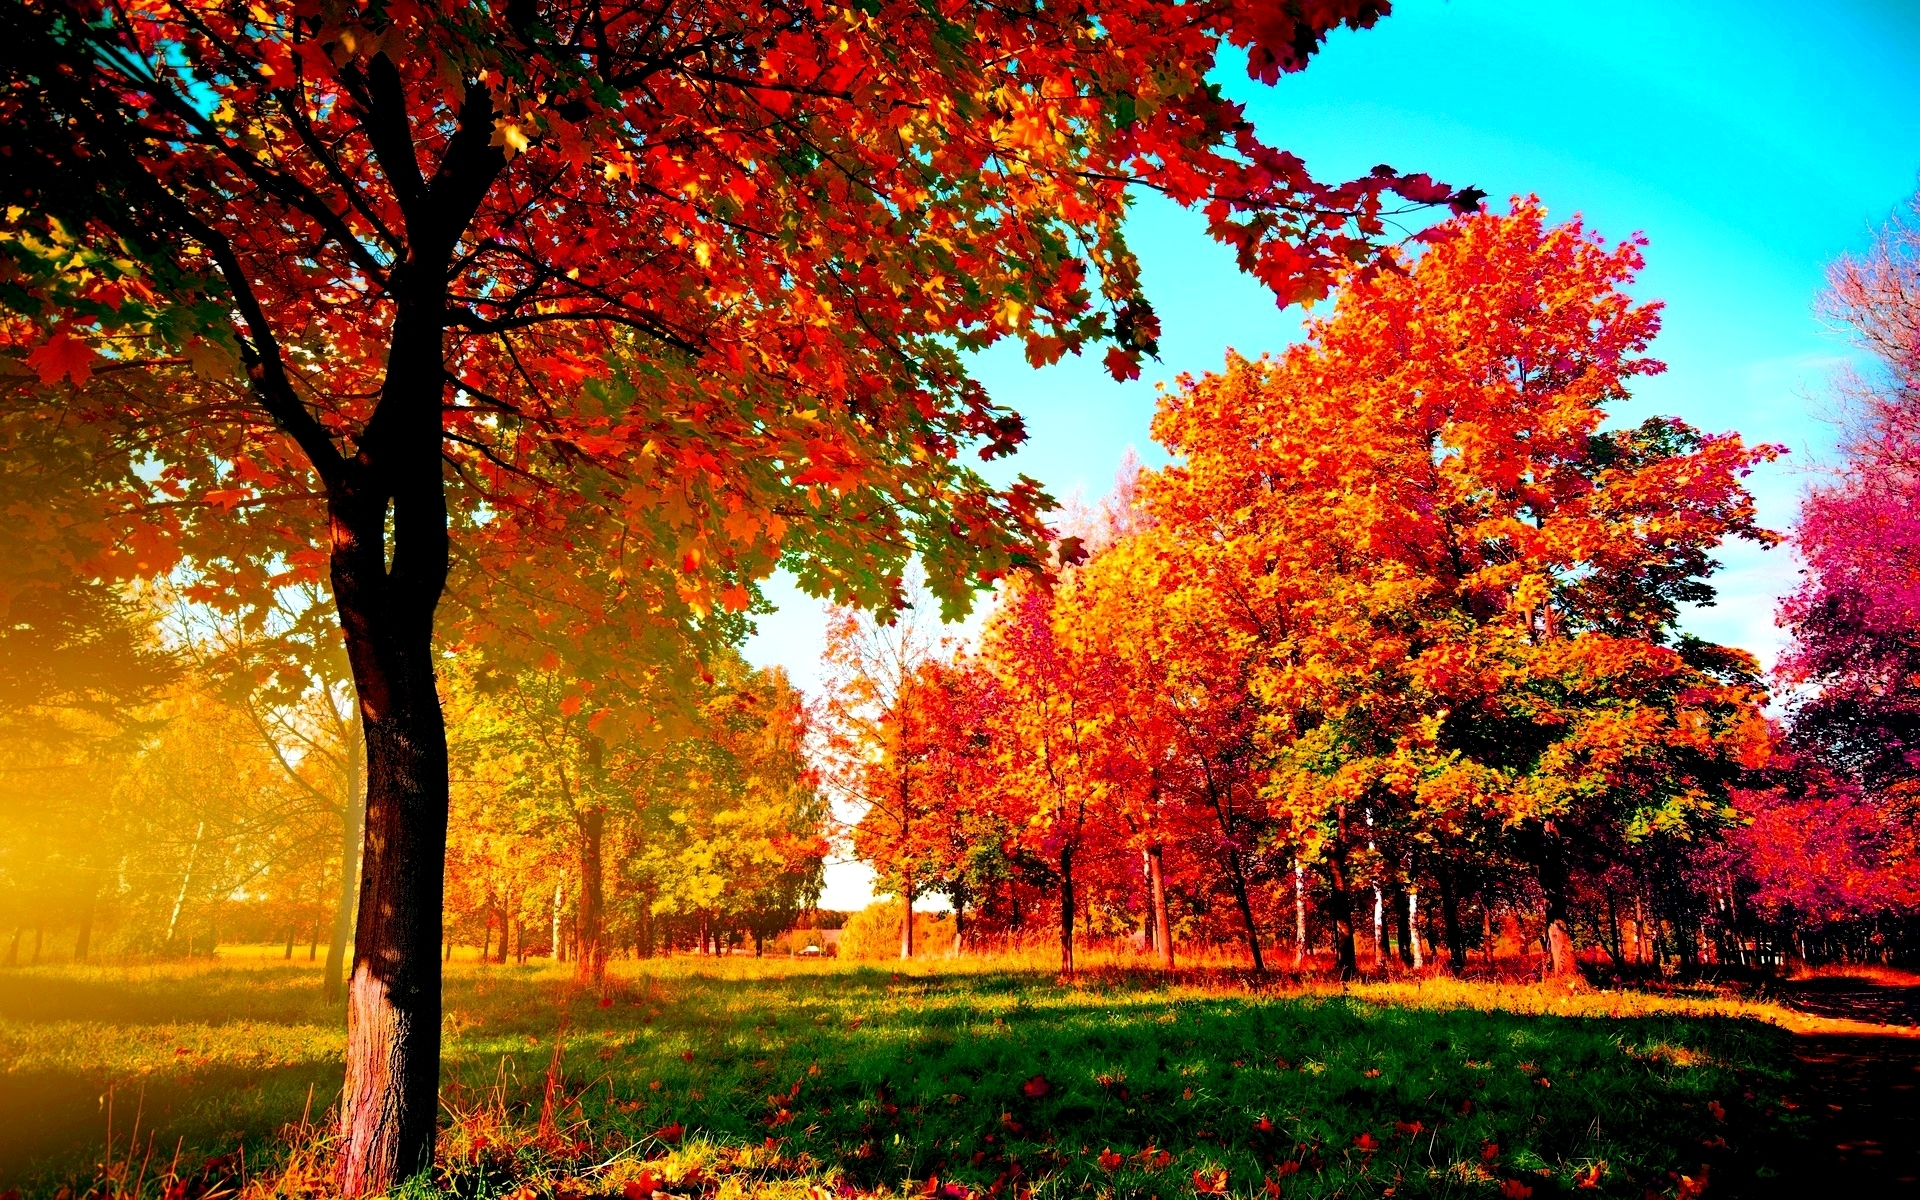 autumn-trees wide desktop background - wallpaper.wiki